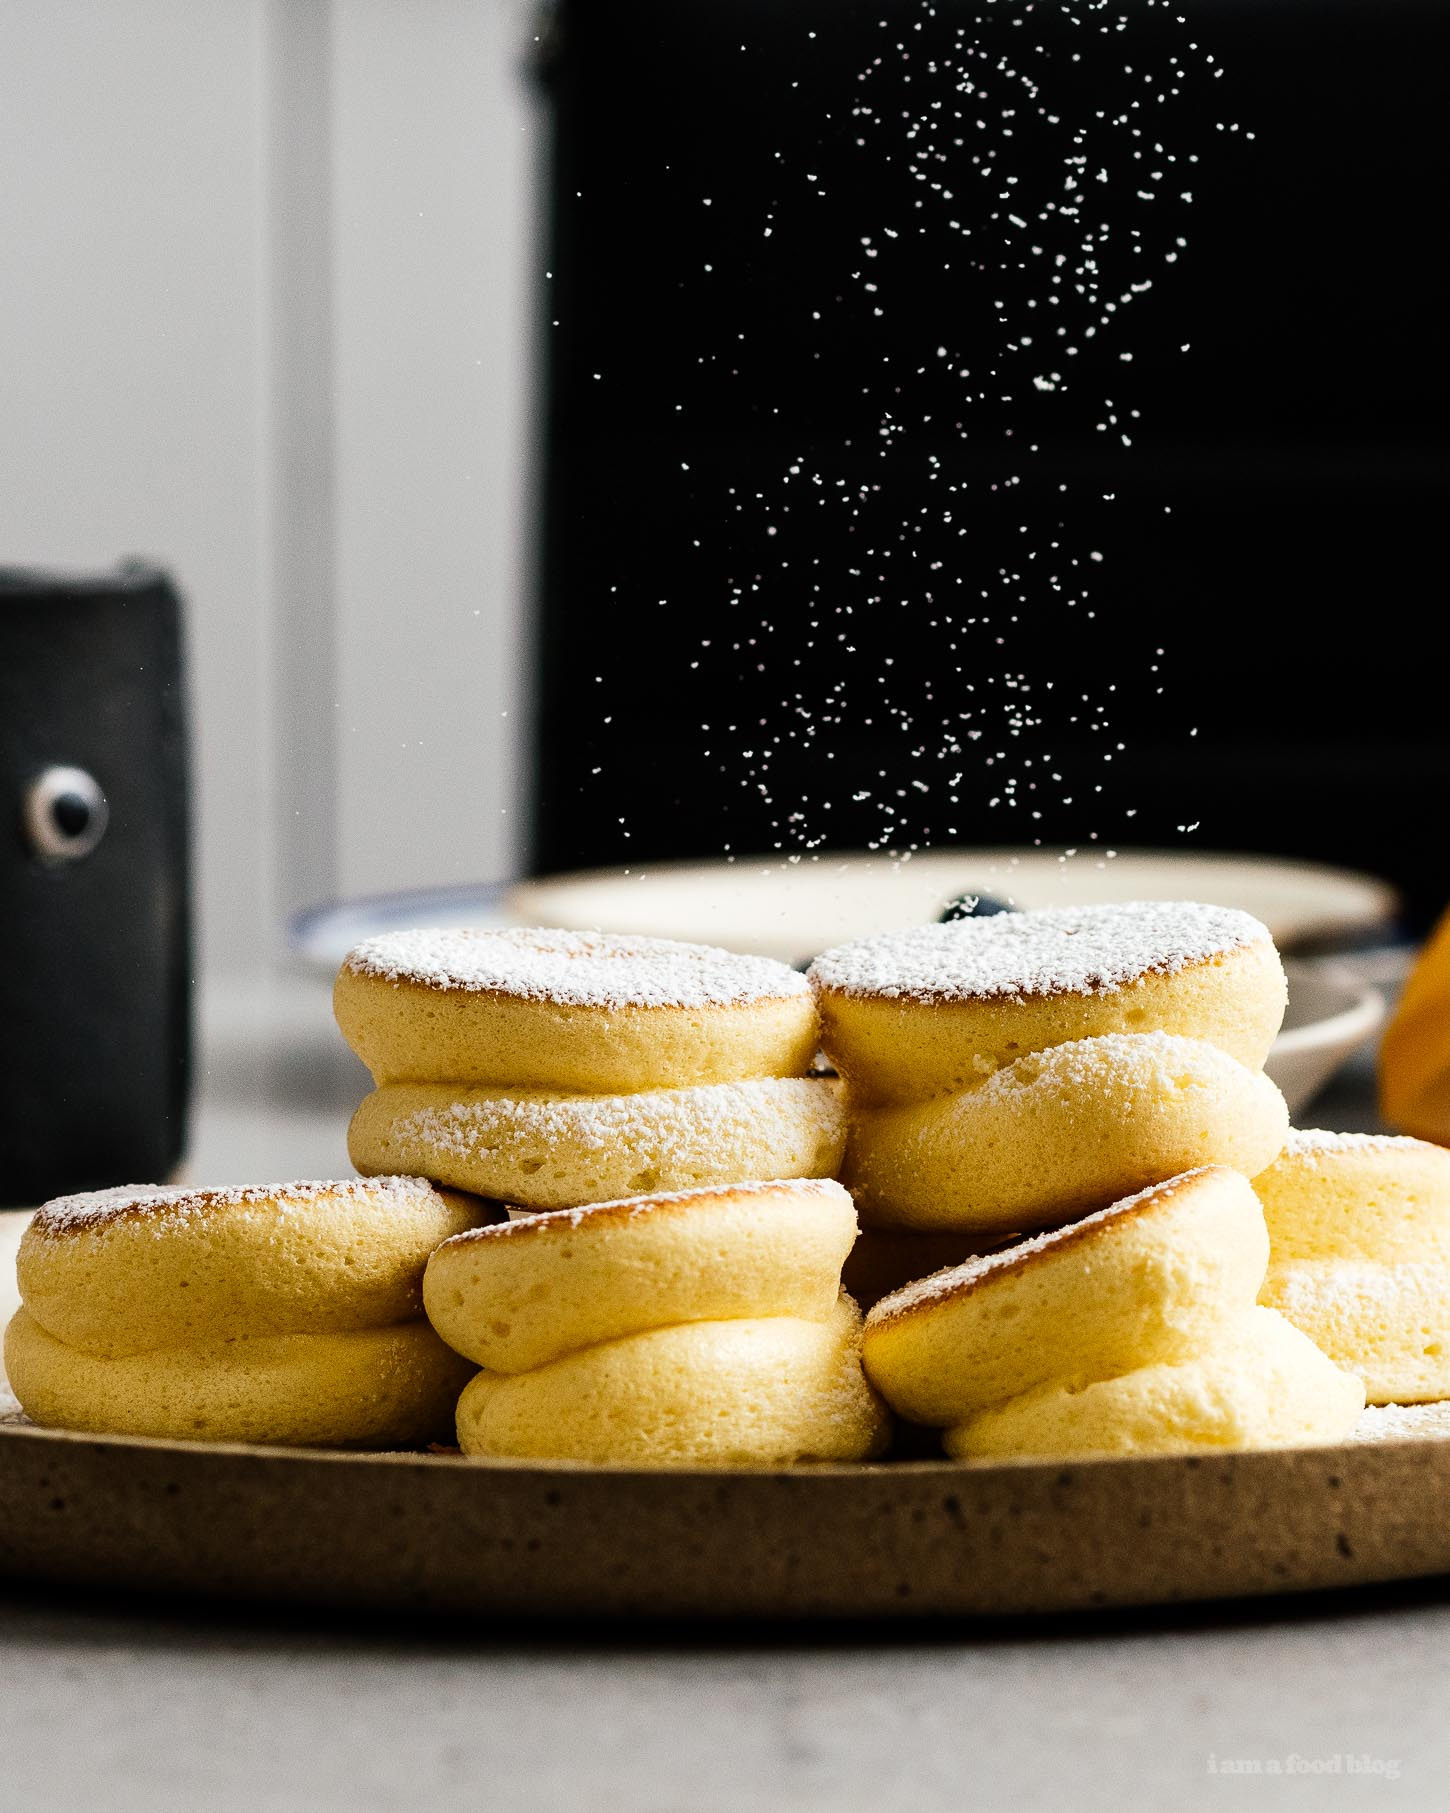 Mile High Mini Japanese Soufflé Pancakes Recipe | www.iamafoodblog.com